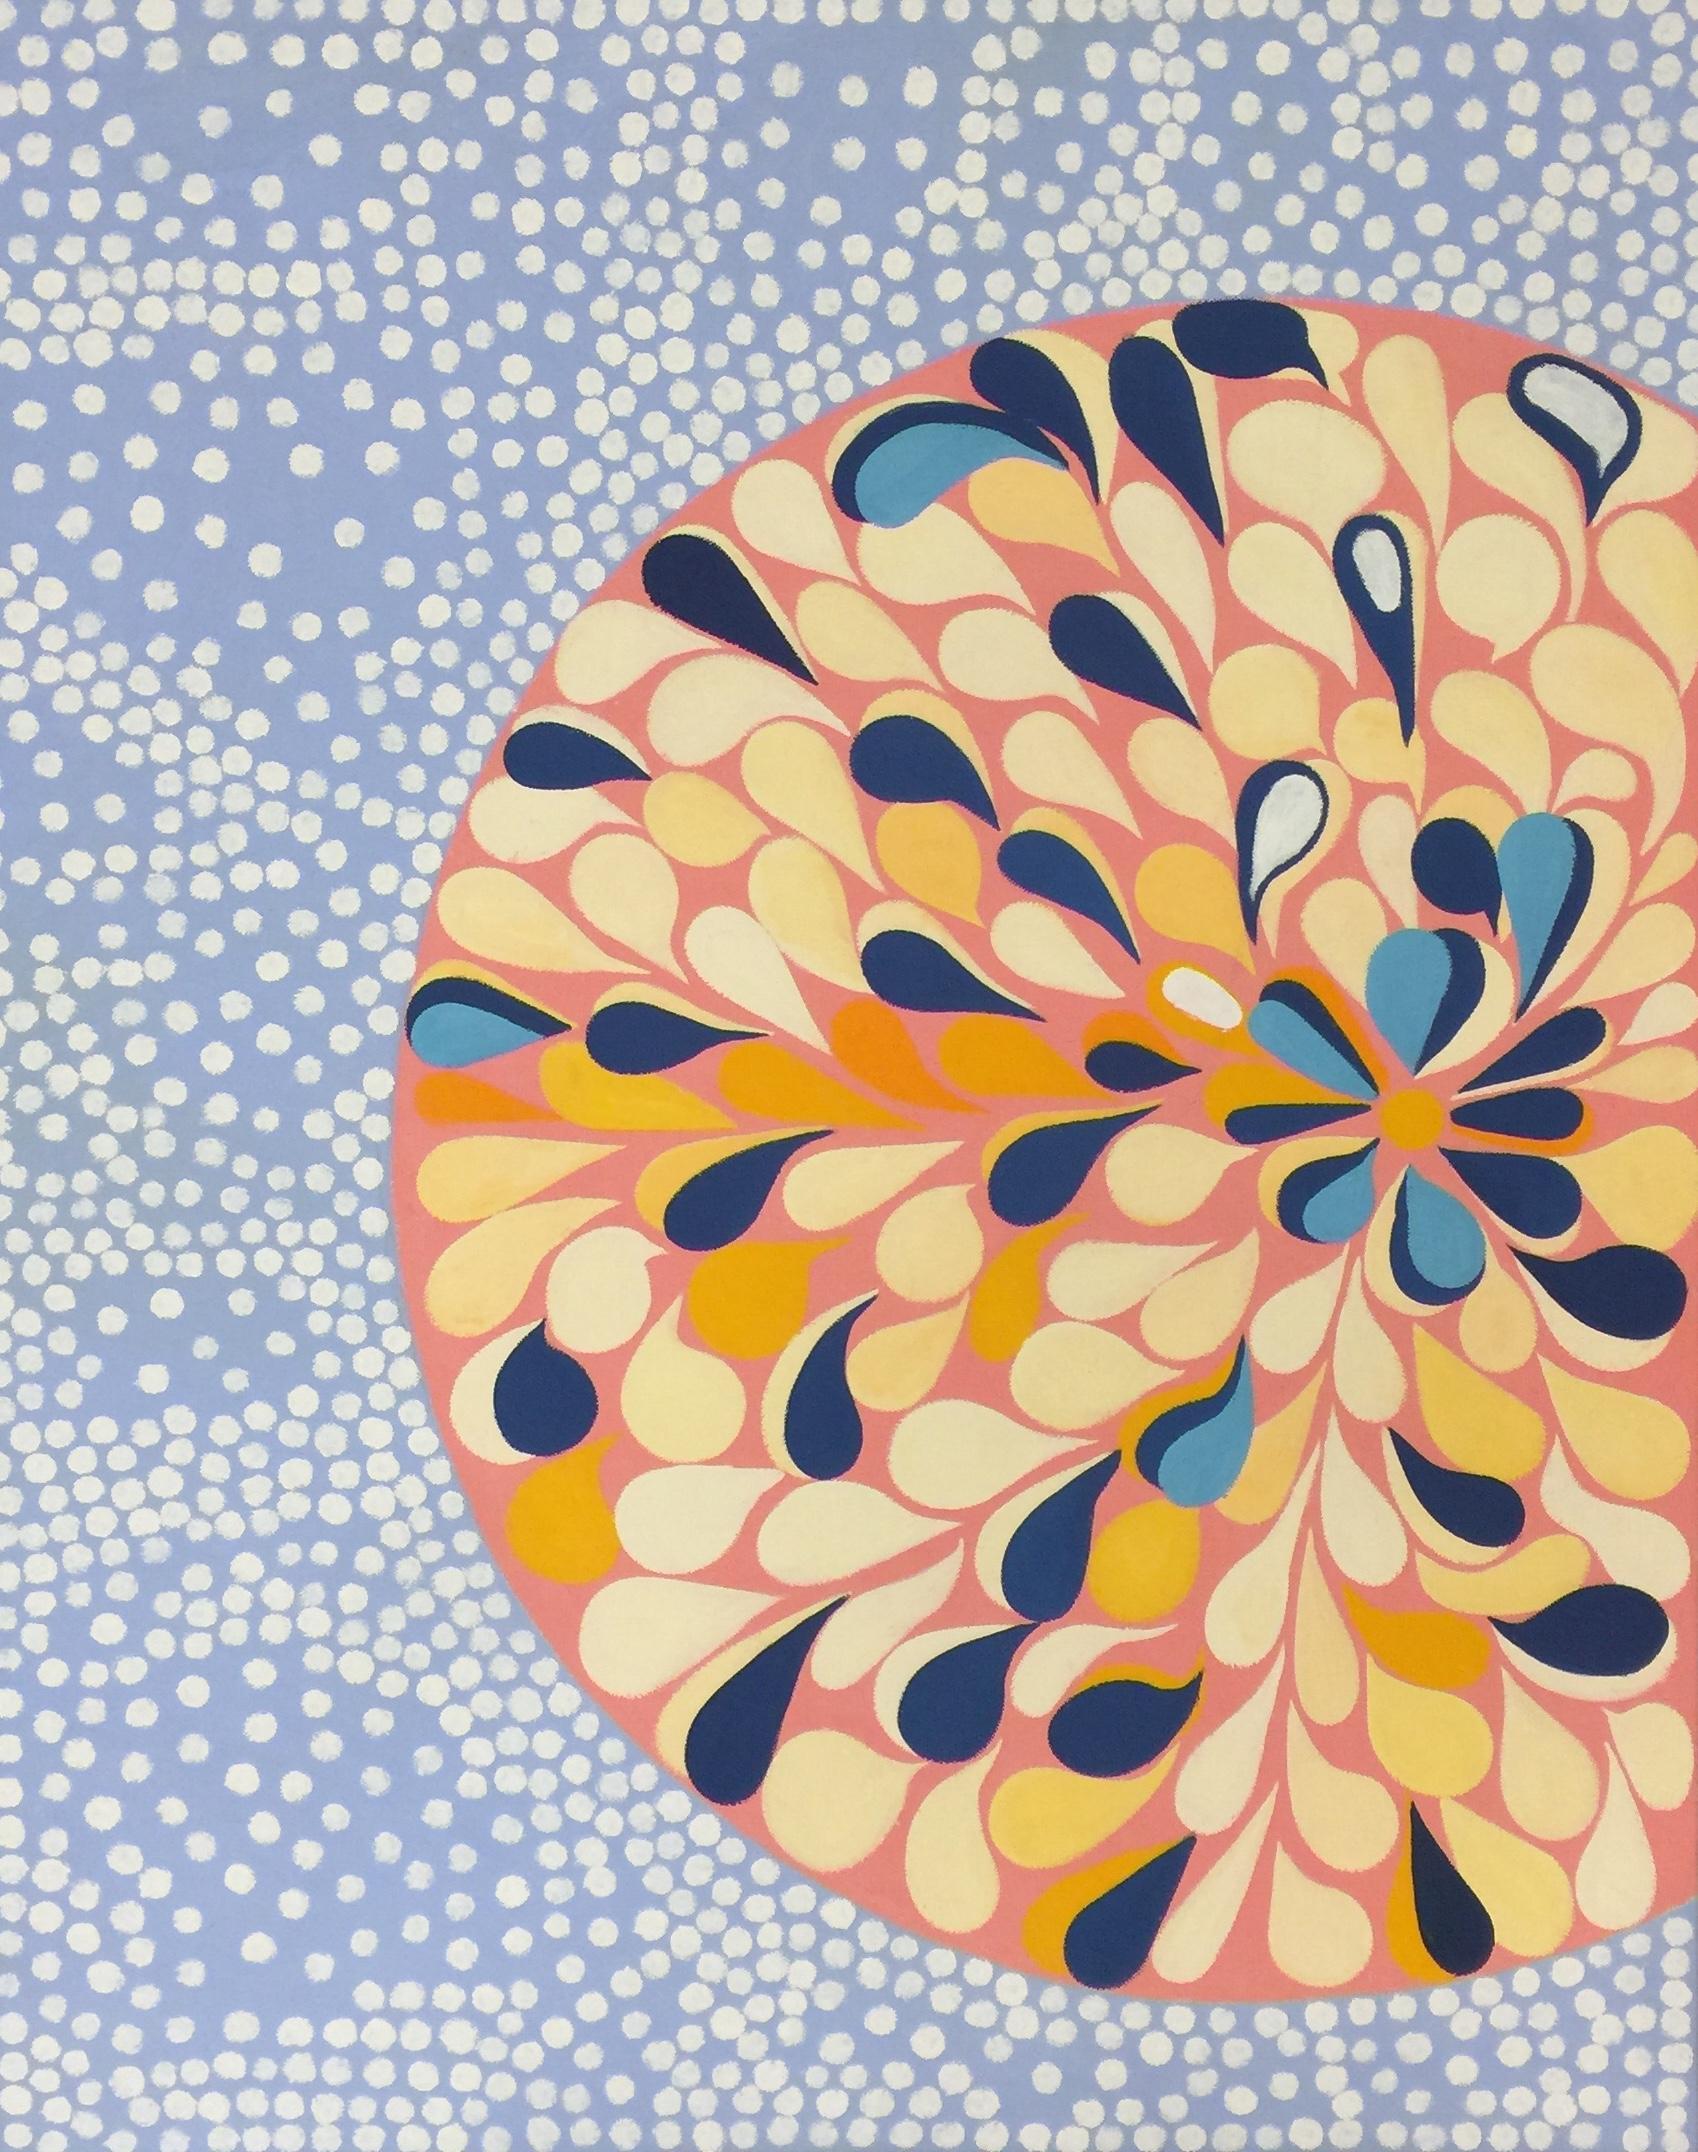 Pop Art Oil Painting on Canvas: 'Flowered'